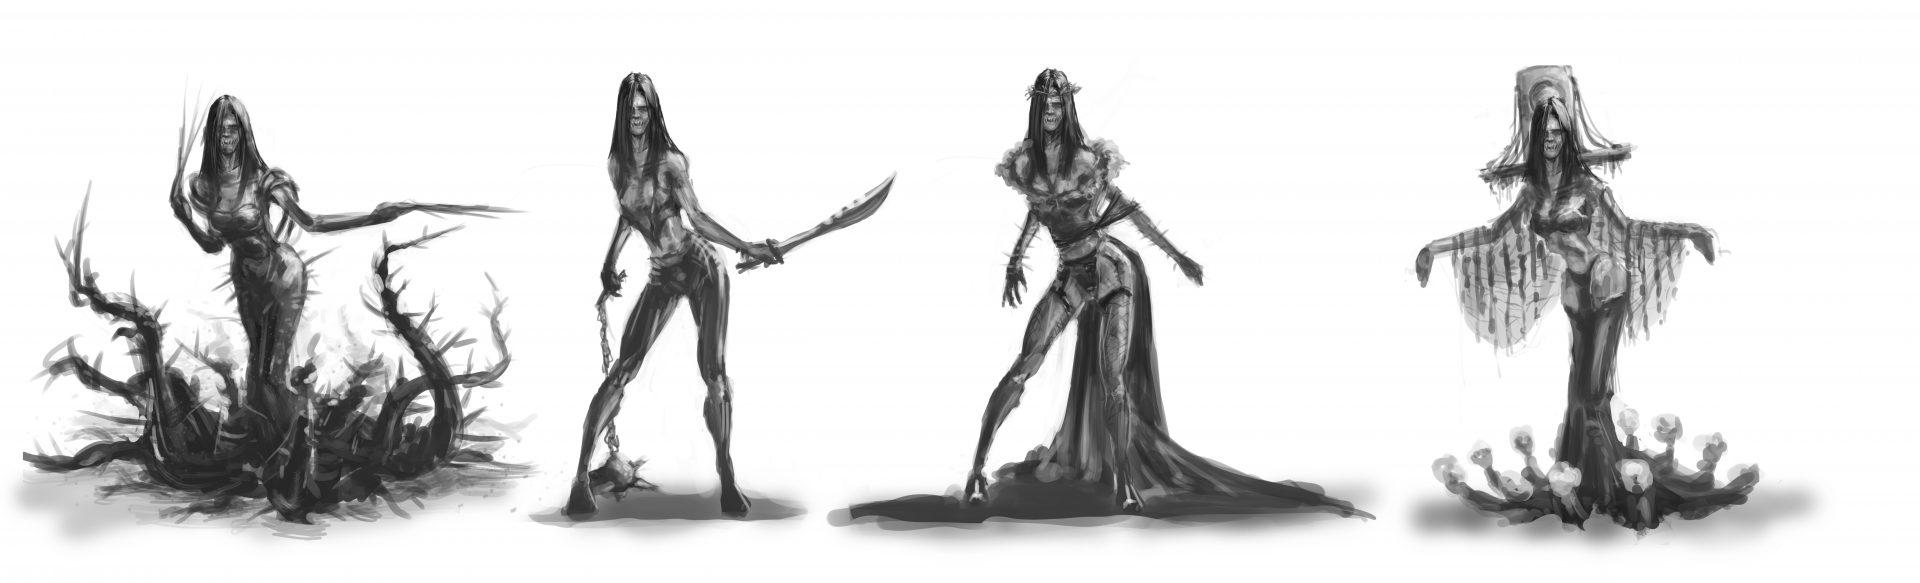 Female Creature Concepts